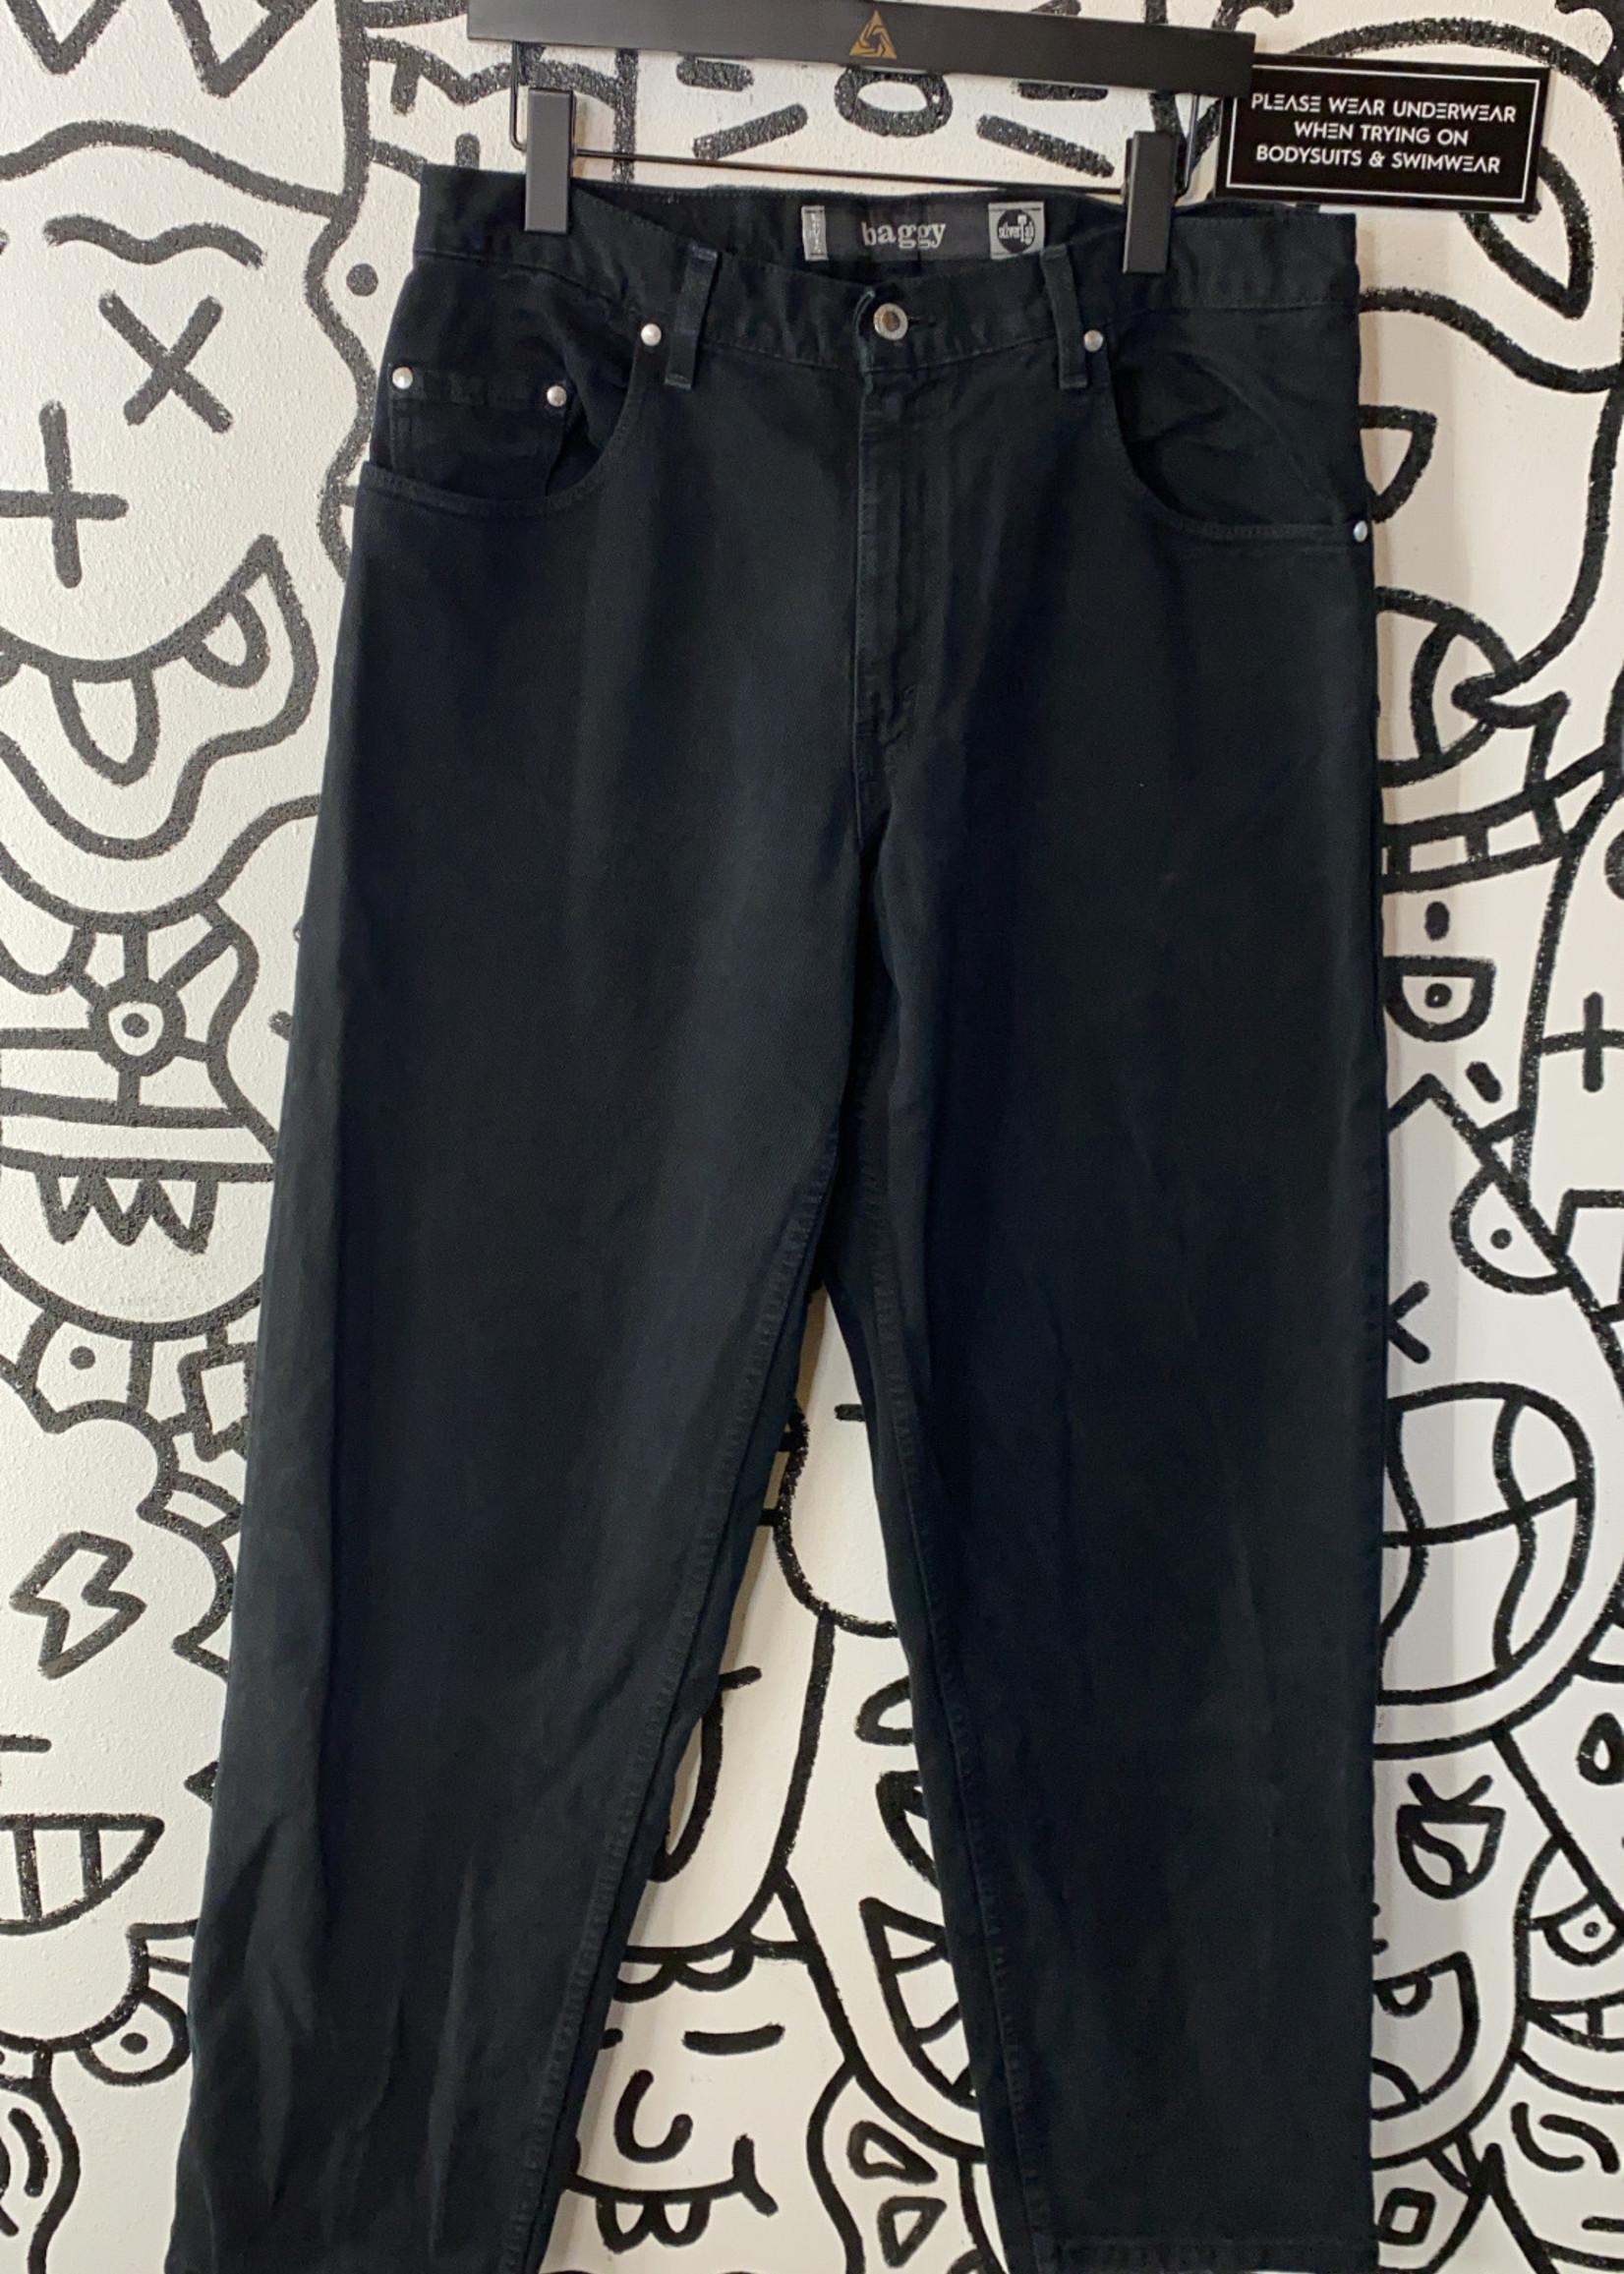 Vintage Levi's 2000 Baggy Black Silvertab Jeans 34x34